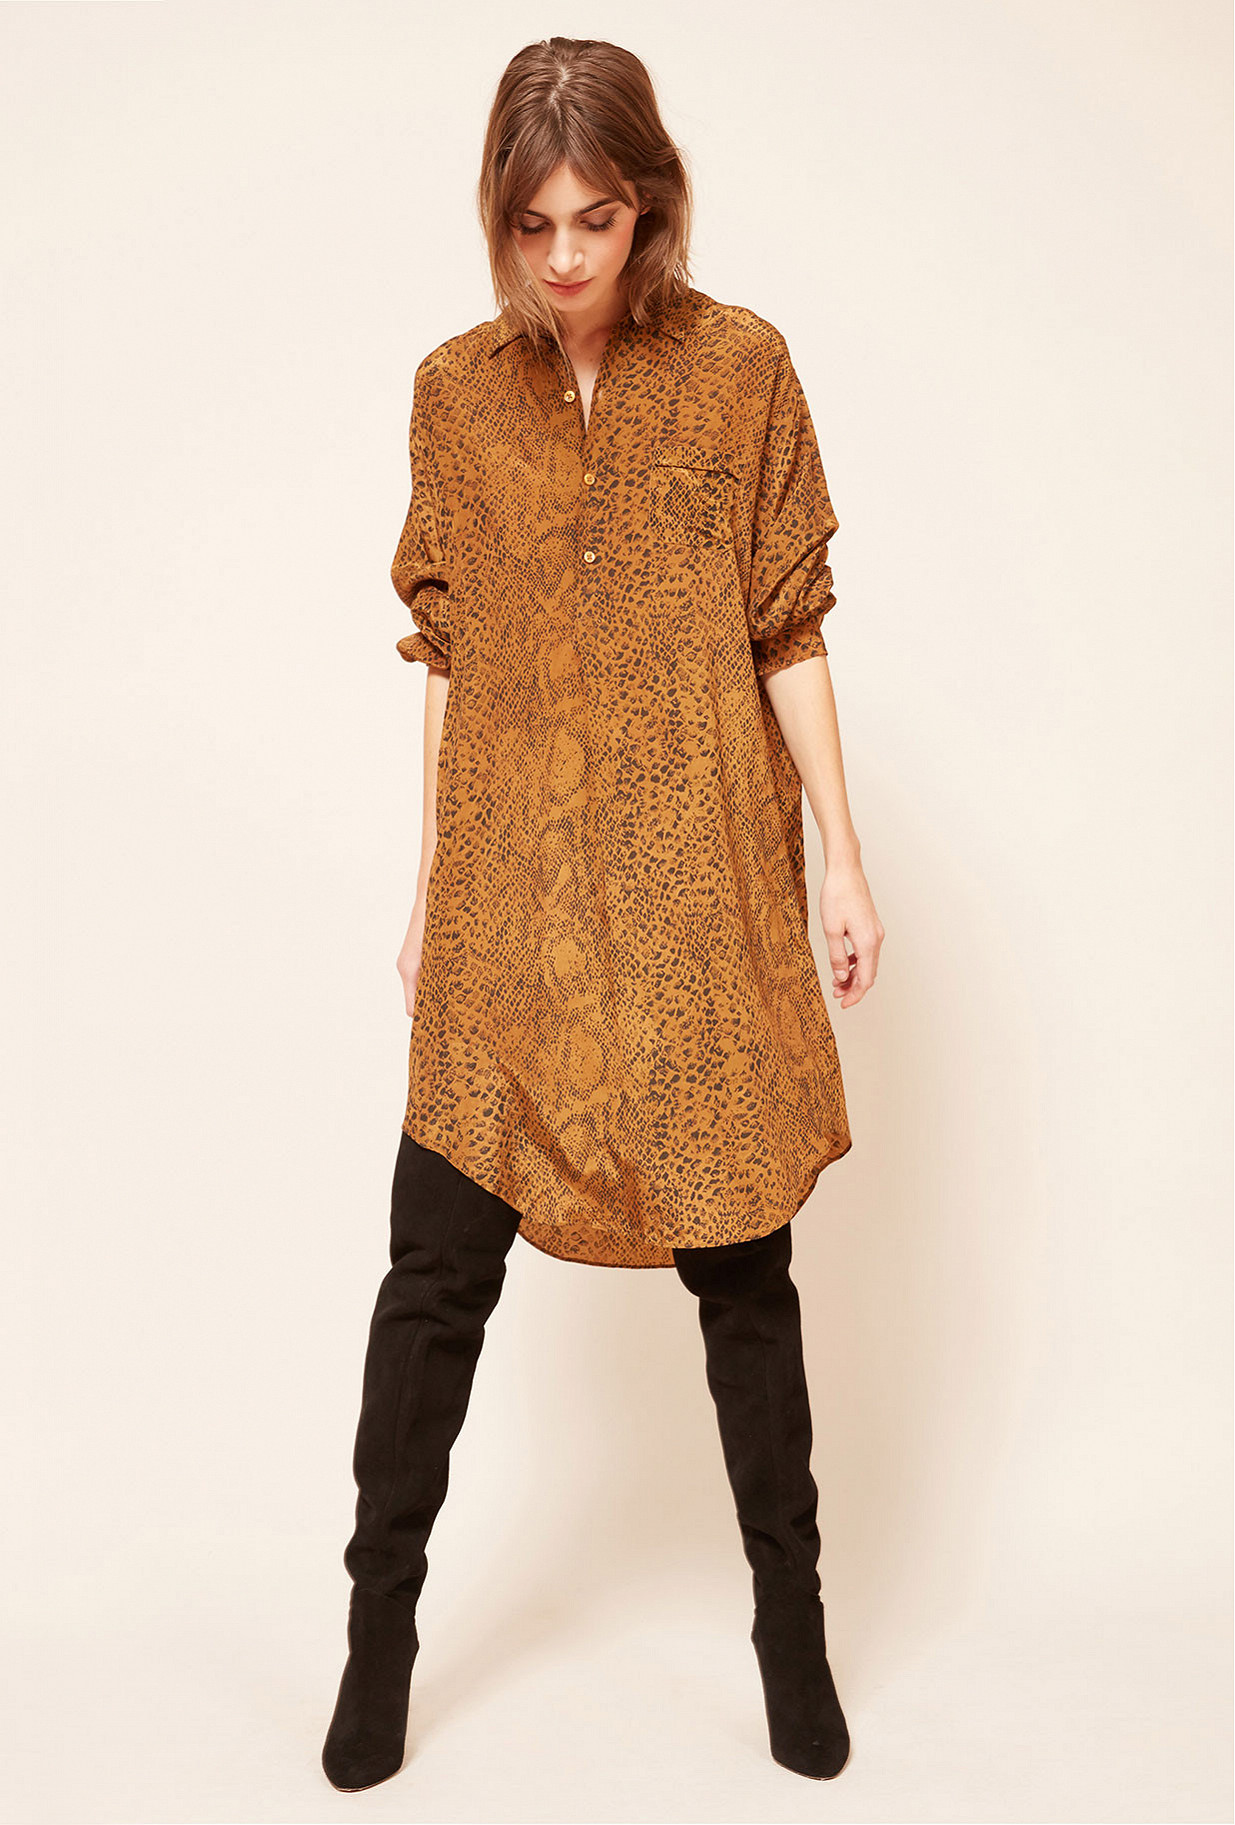 Ocre print  Shirt  Kaa Mes demoiselles fashion clothes designer Paris